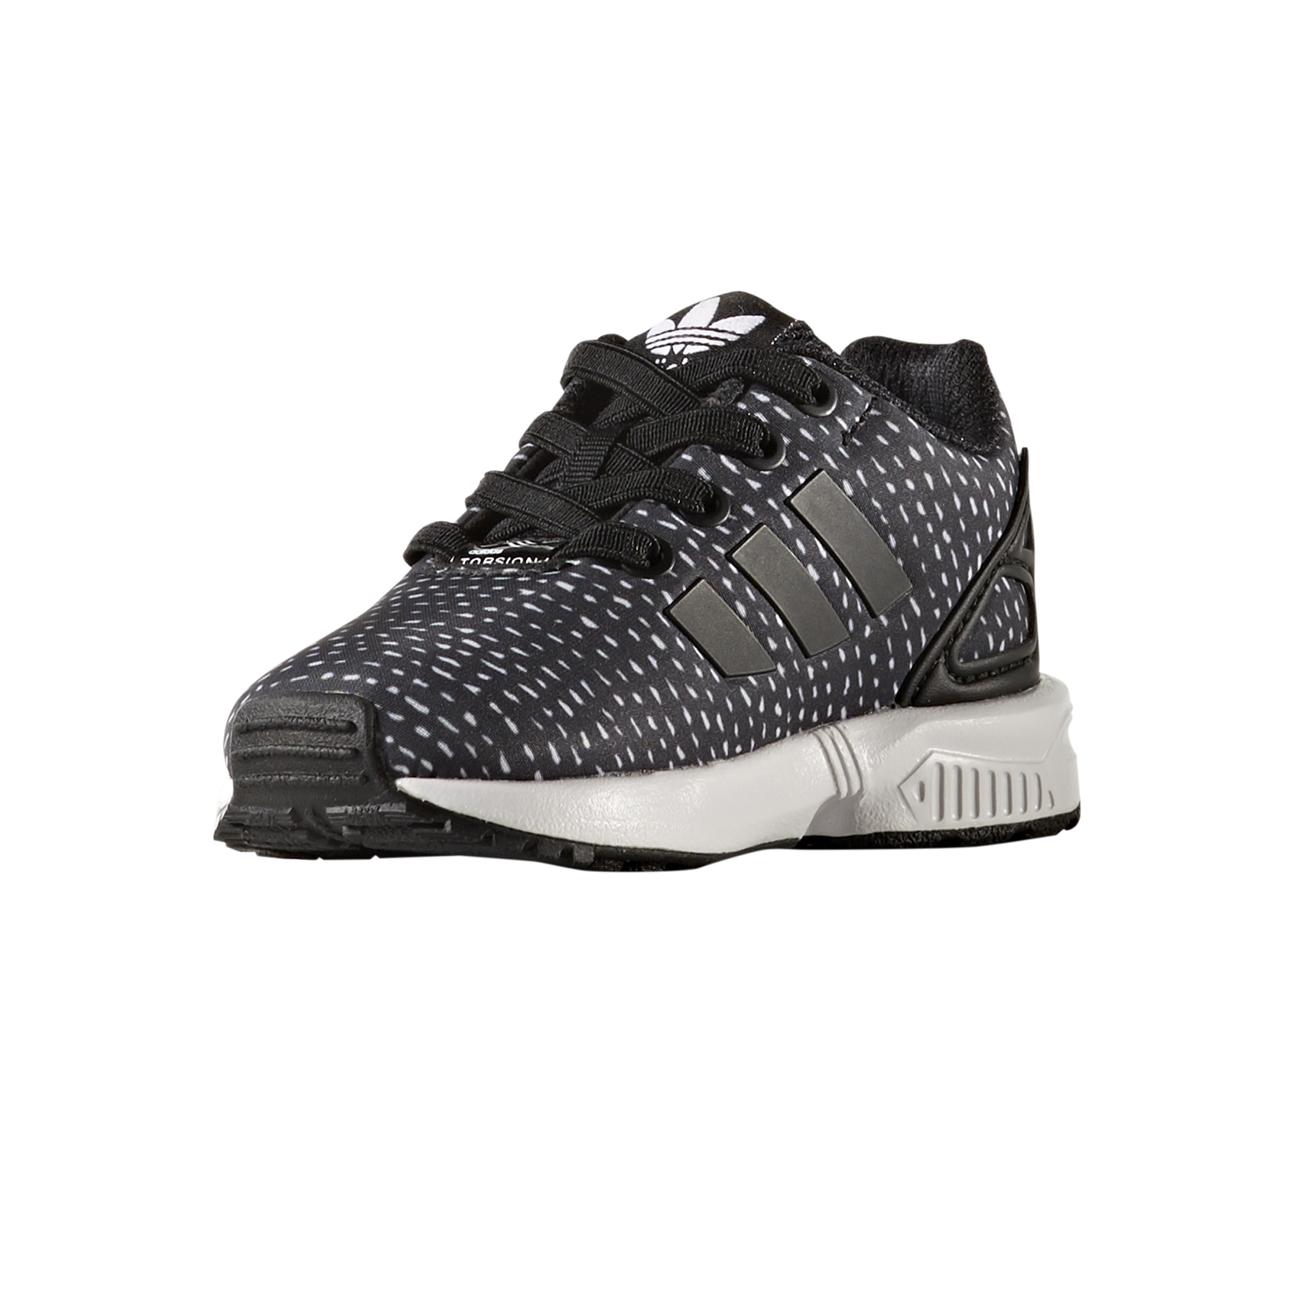 265755572f5a3 Adidas Originals ZX Flux EL Infant (core black core black ftwr white)